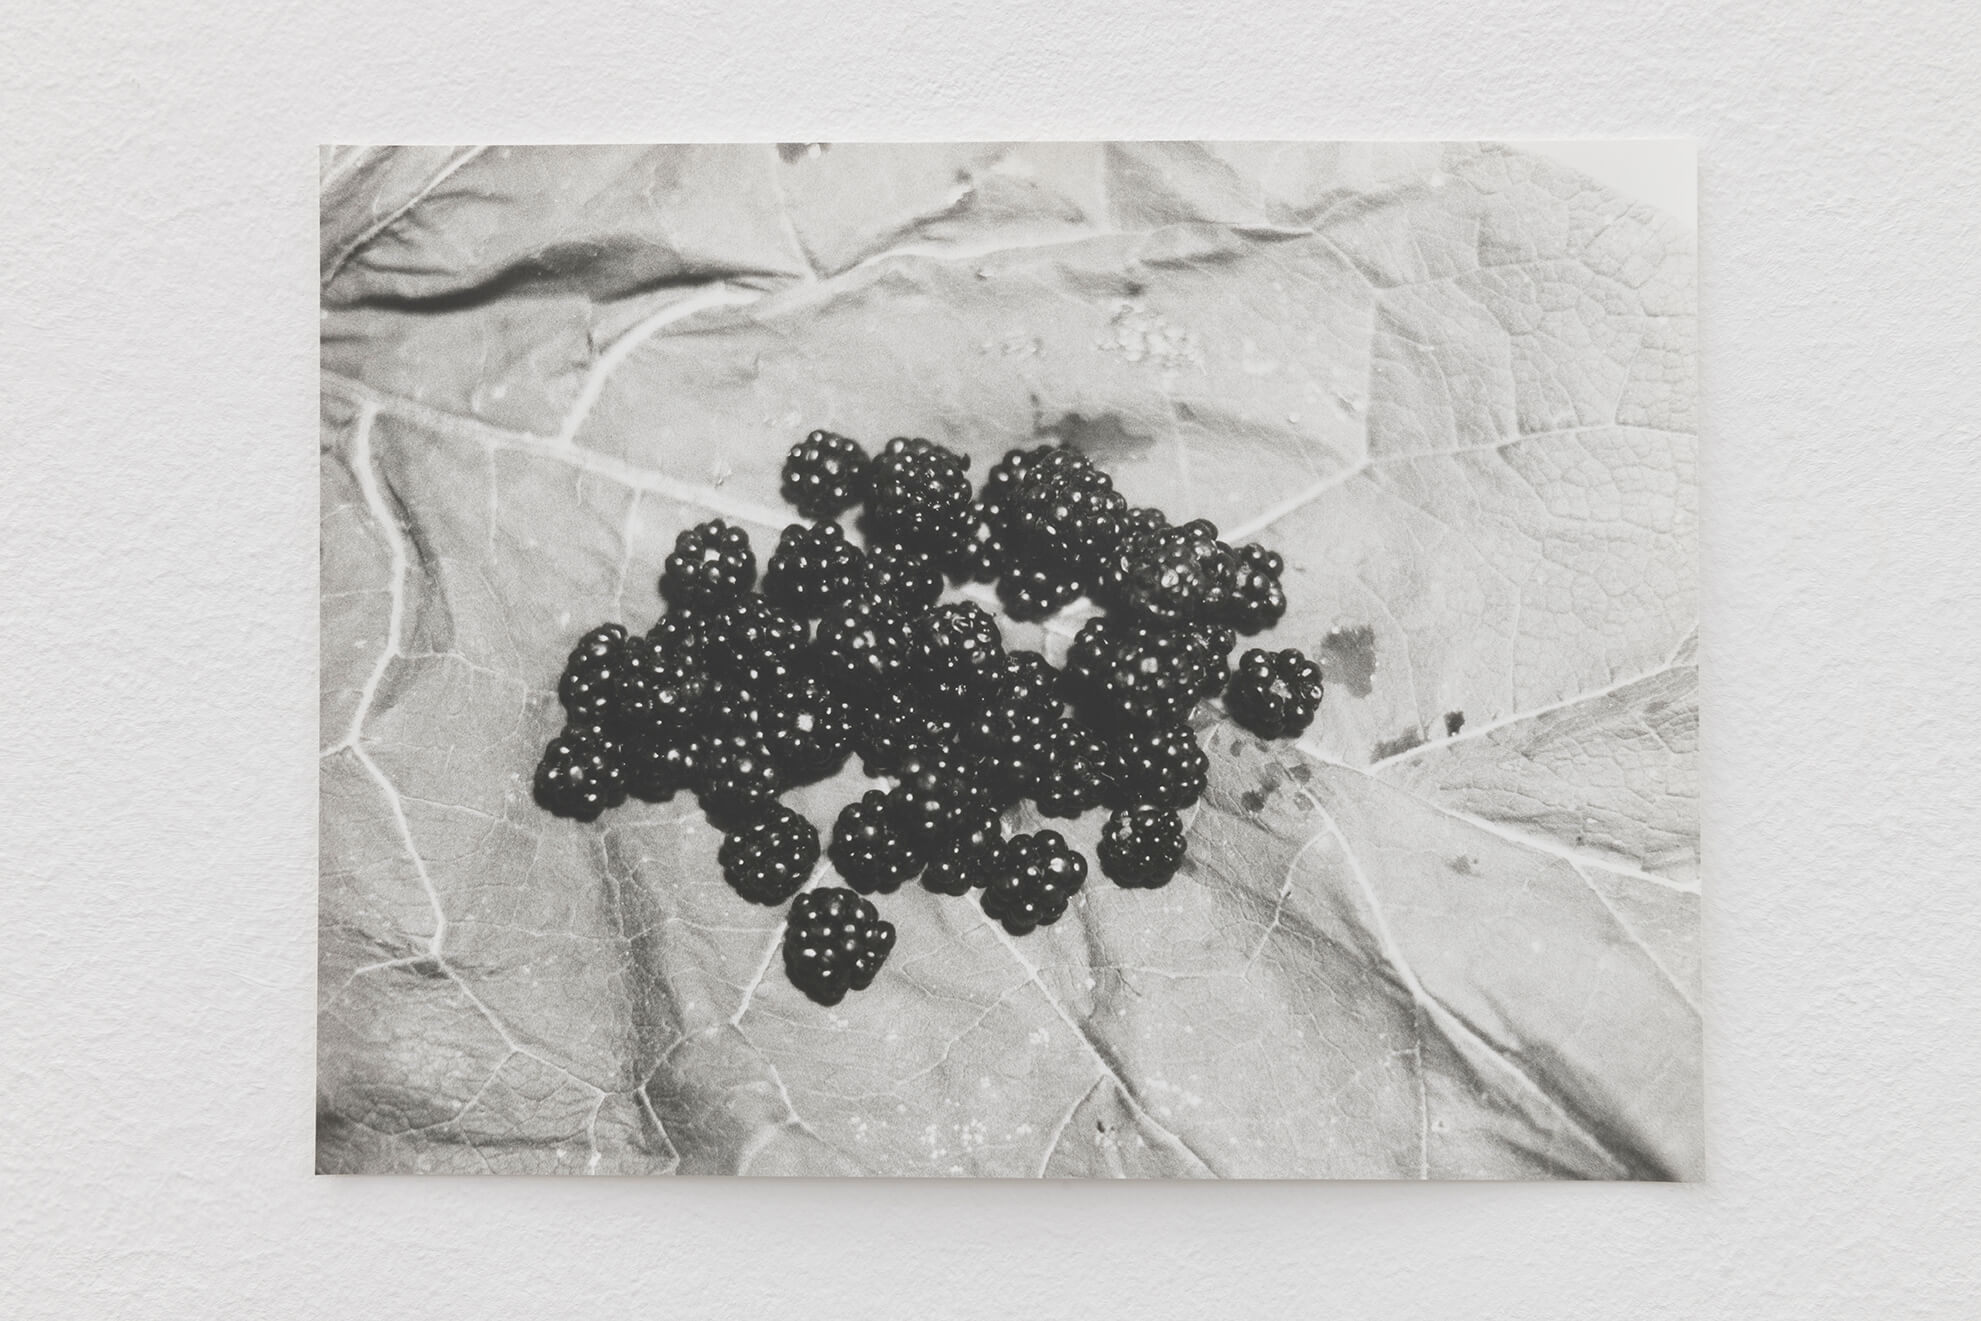 Blackberries, 2021 | JOCHEN LEMPERT: VISIBLE LIGHT | ProjecteSD